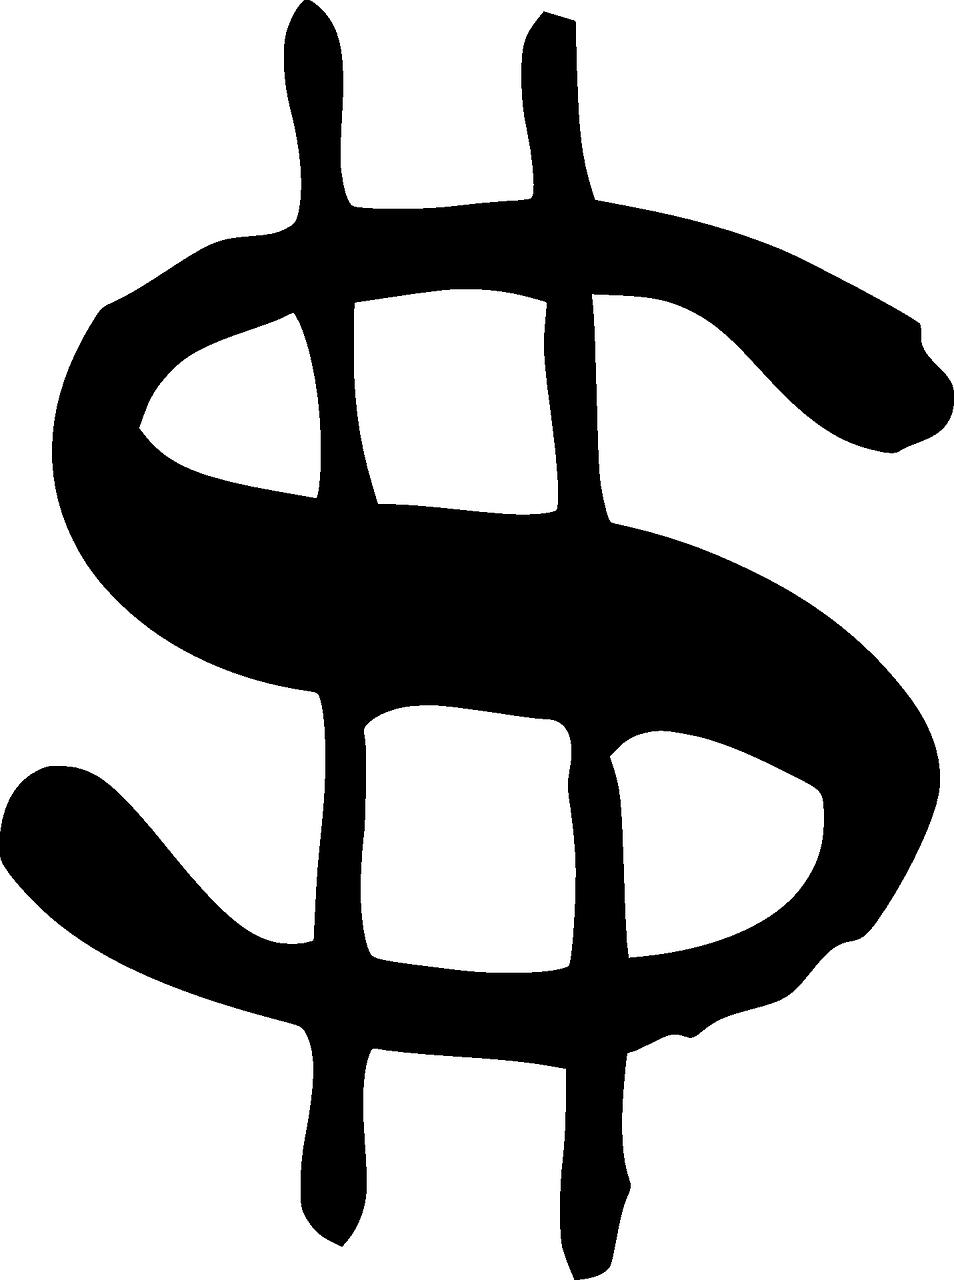 dollar-157900_1280.png